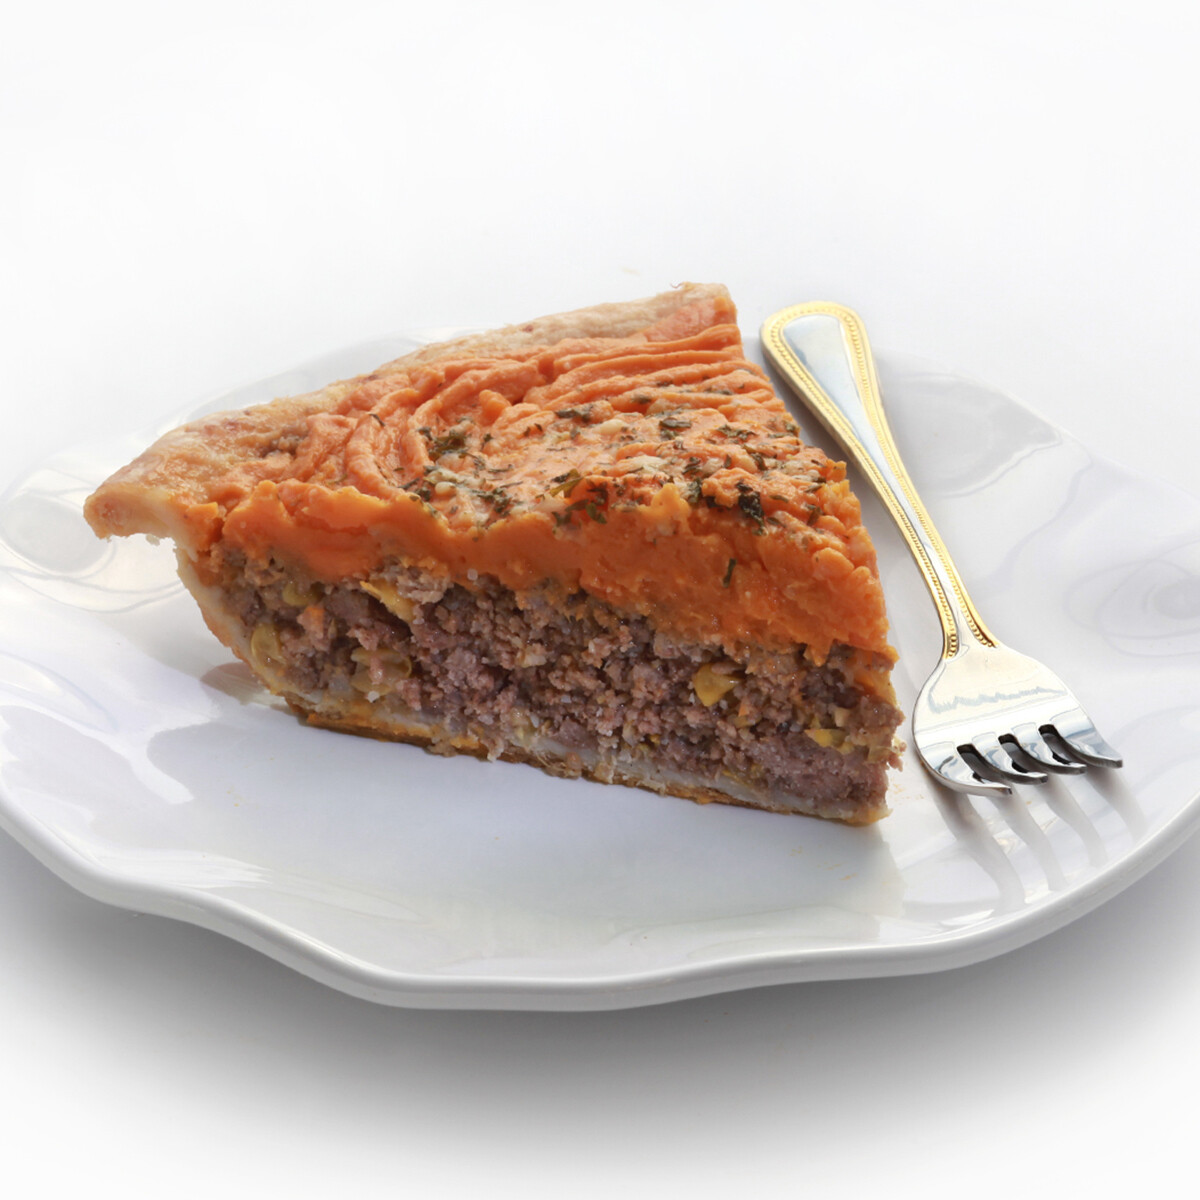 Large Homestyle Sweet Potato Shepards Pie | Centerville Pie Company